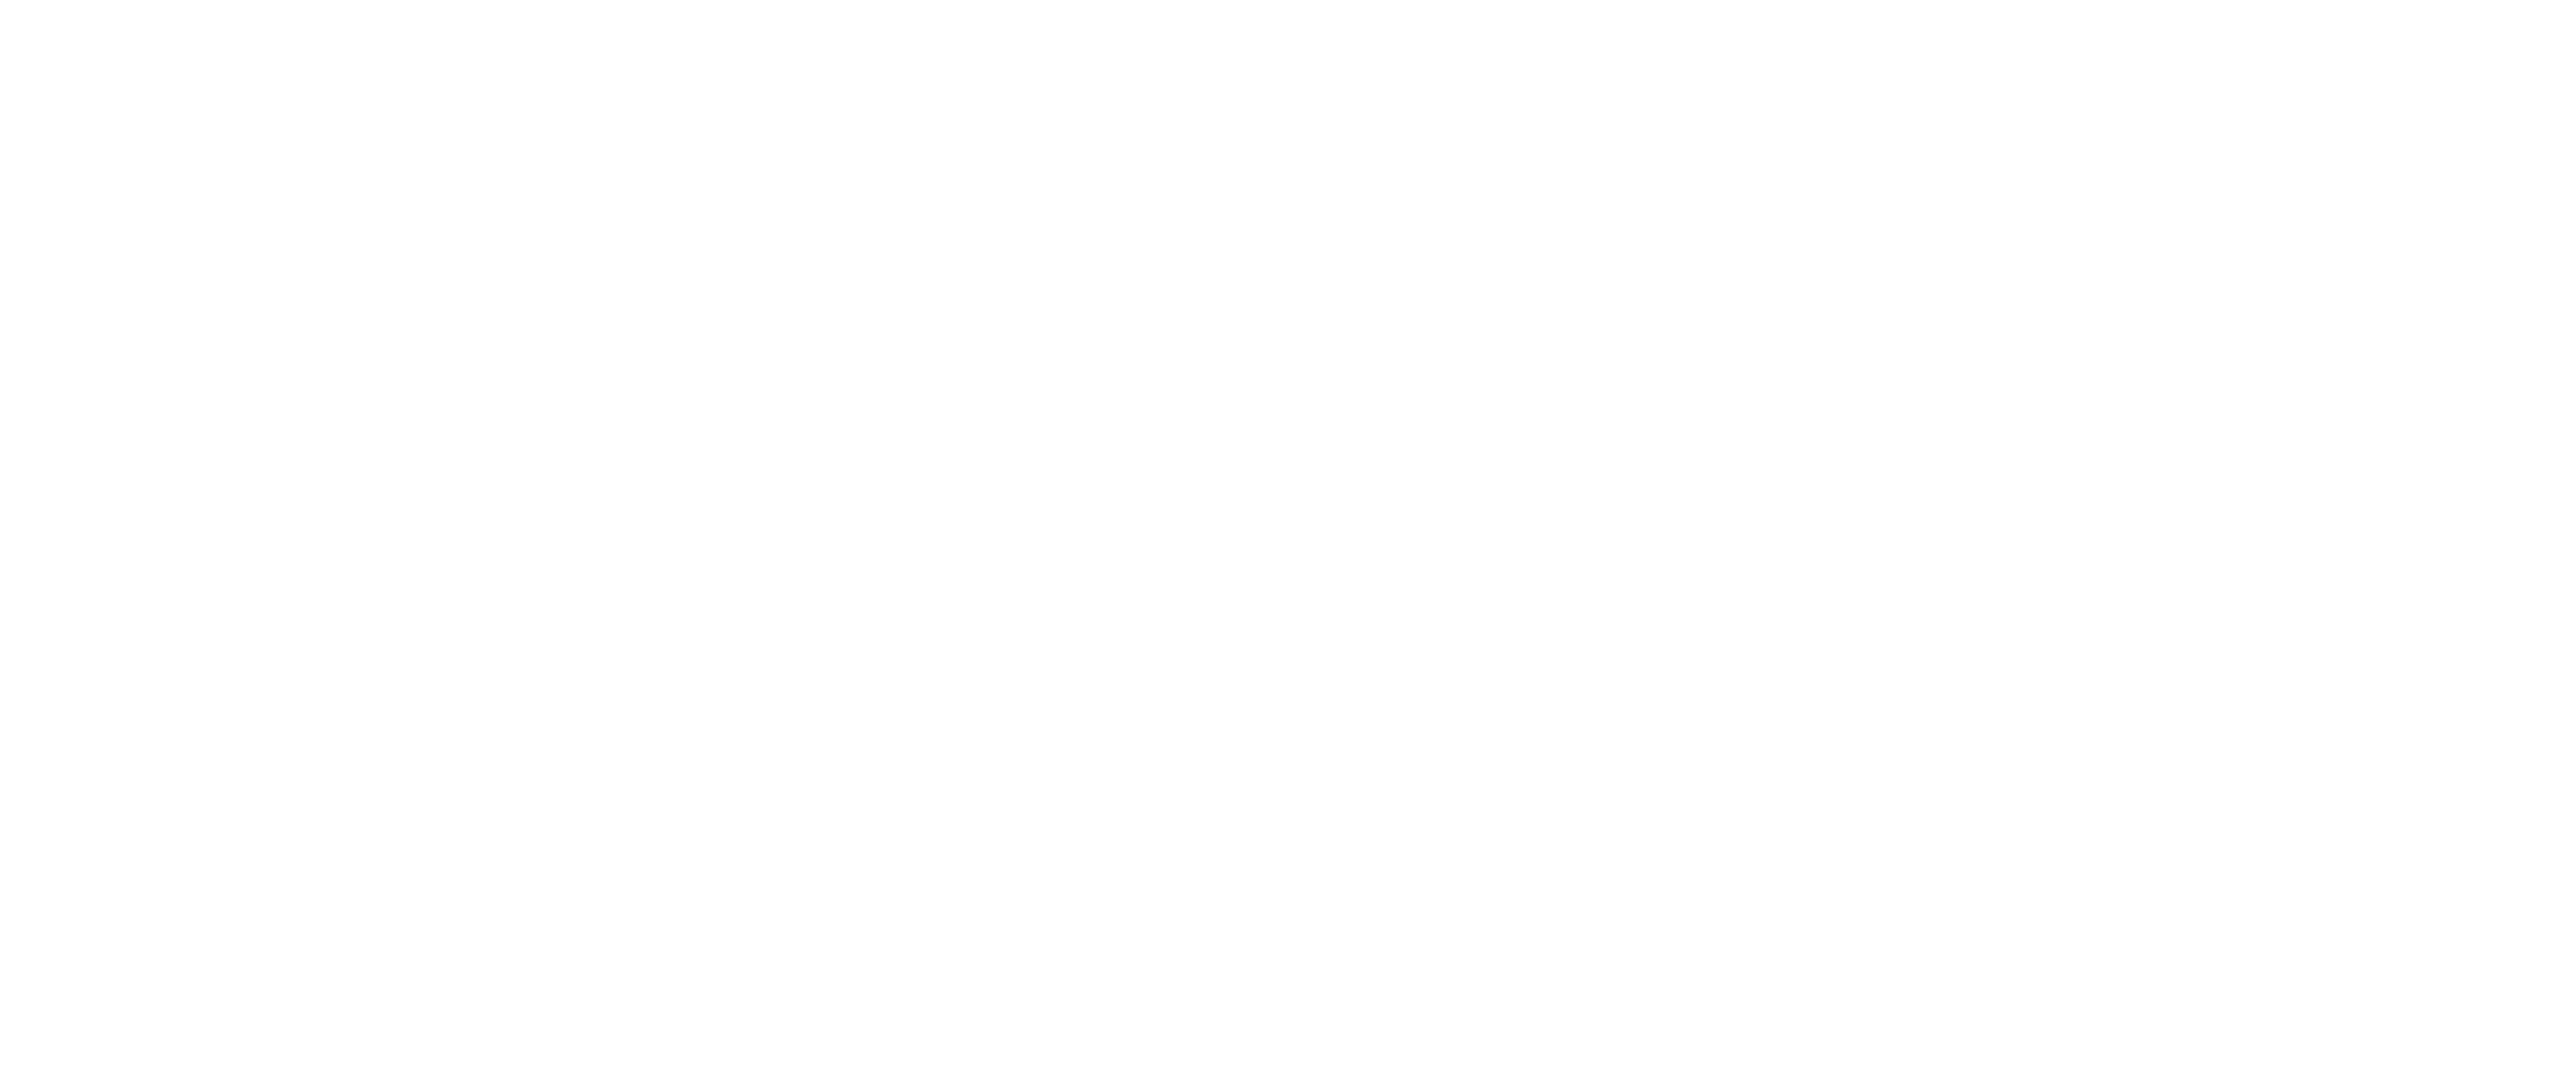 The San Francisco Chronicle